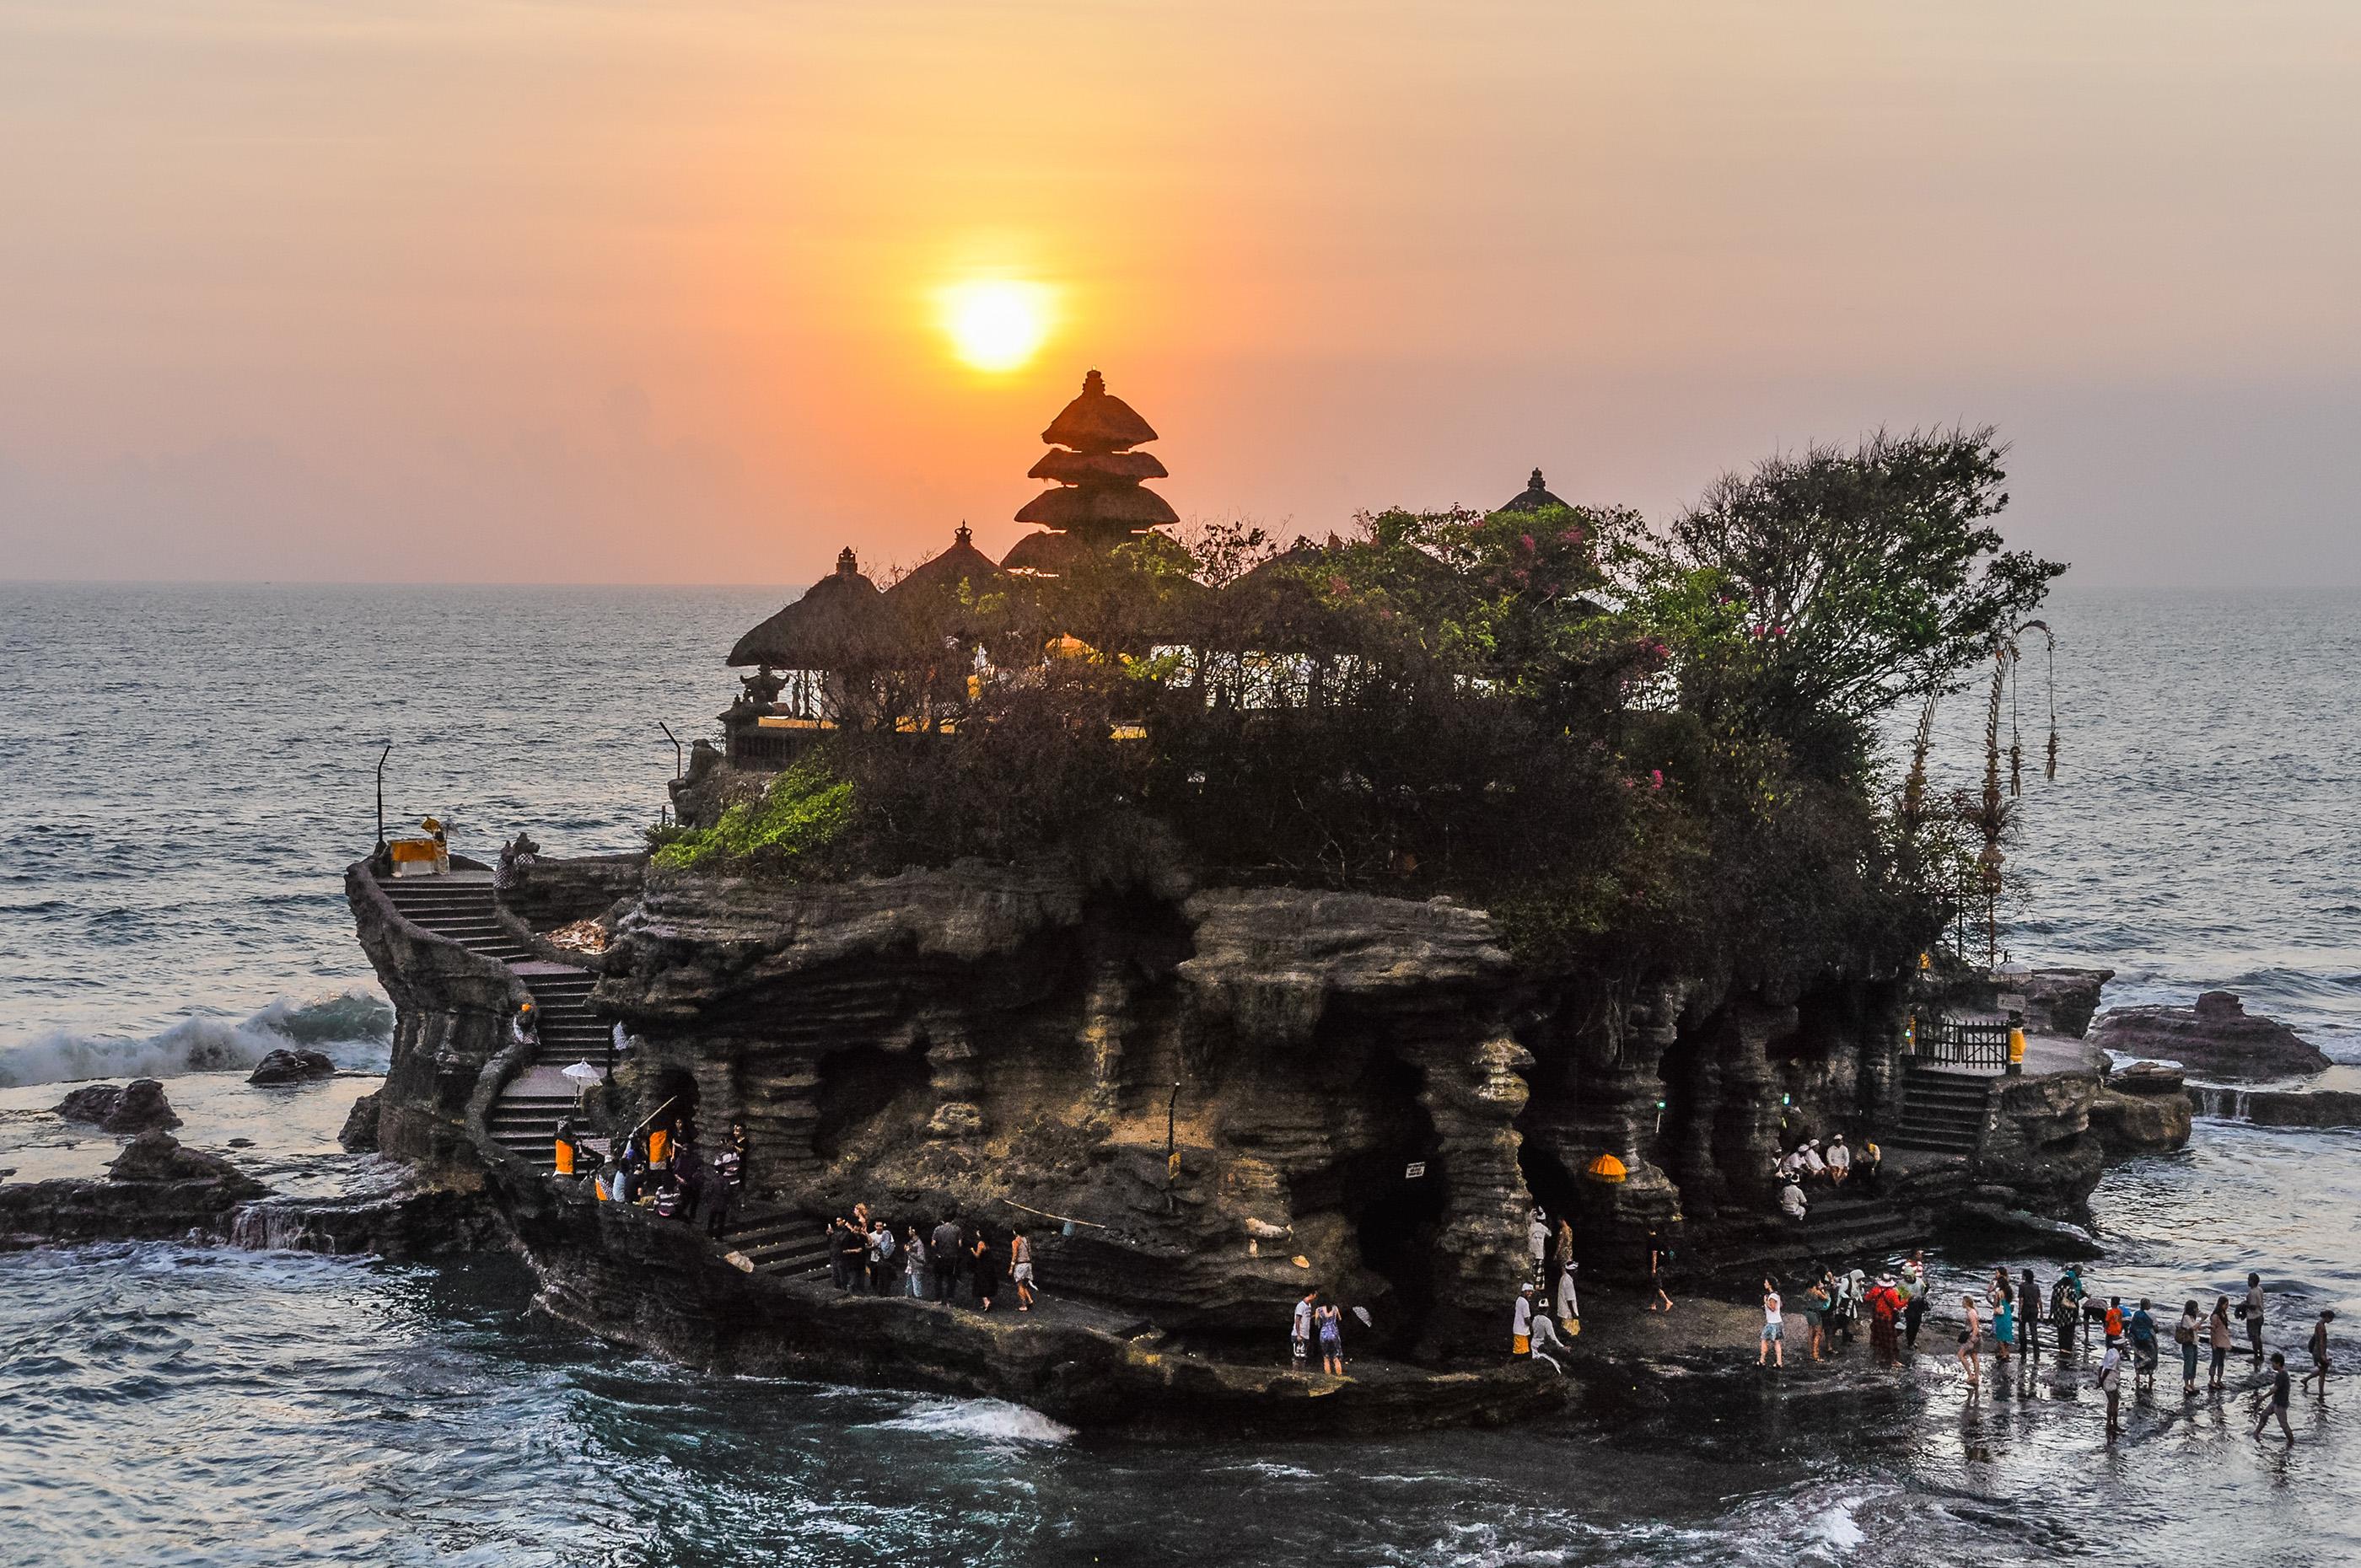 180803-cheapest-international-destinations-bali